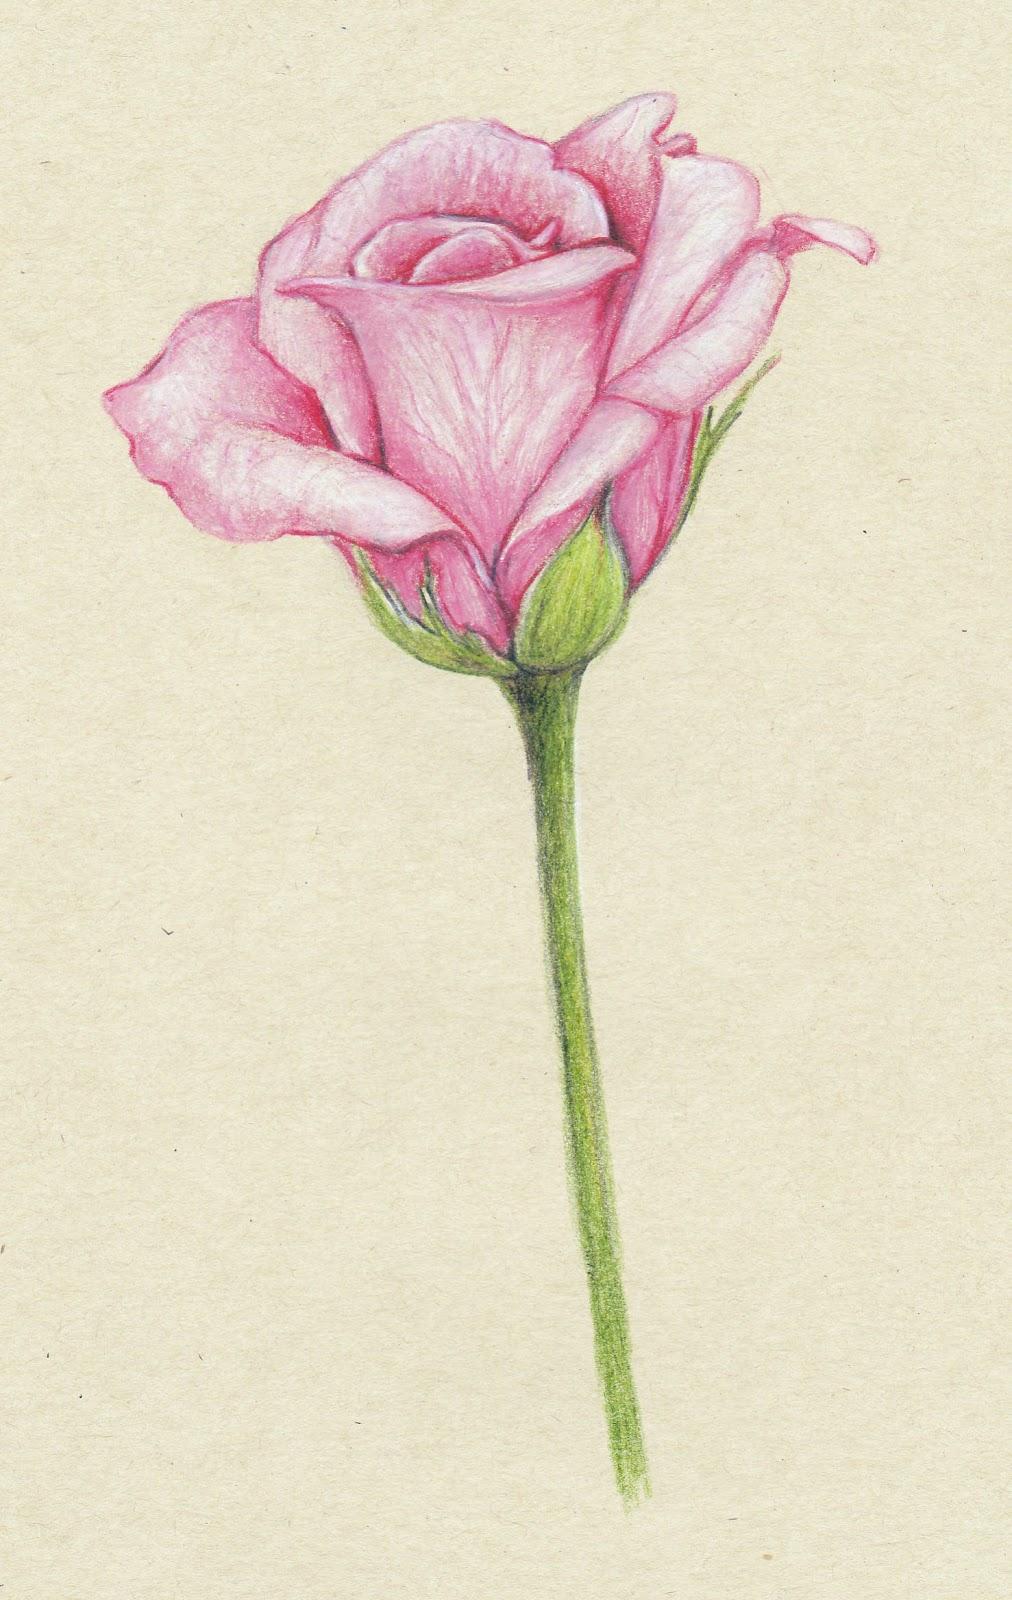 Drawn rose bush color shading Things pink of pencil